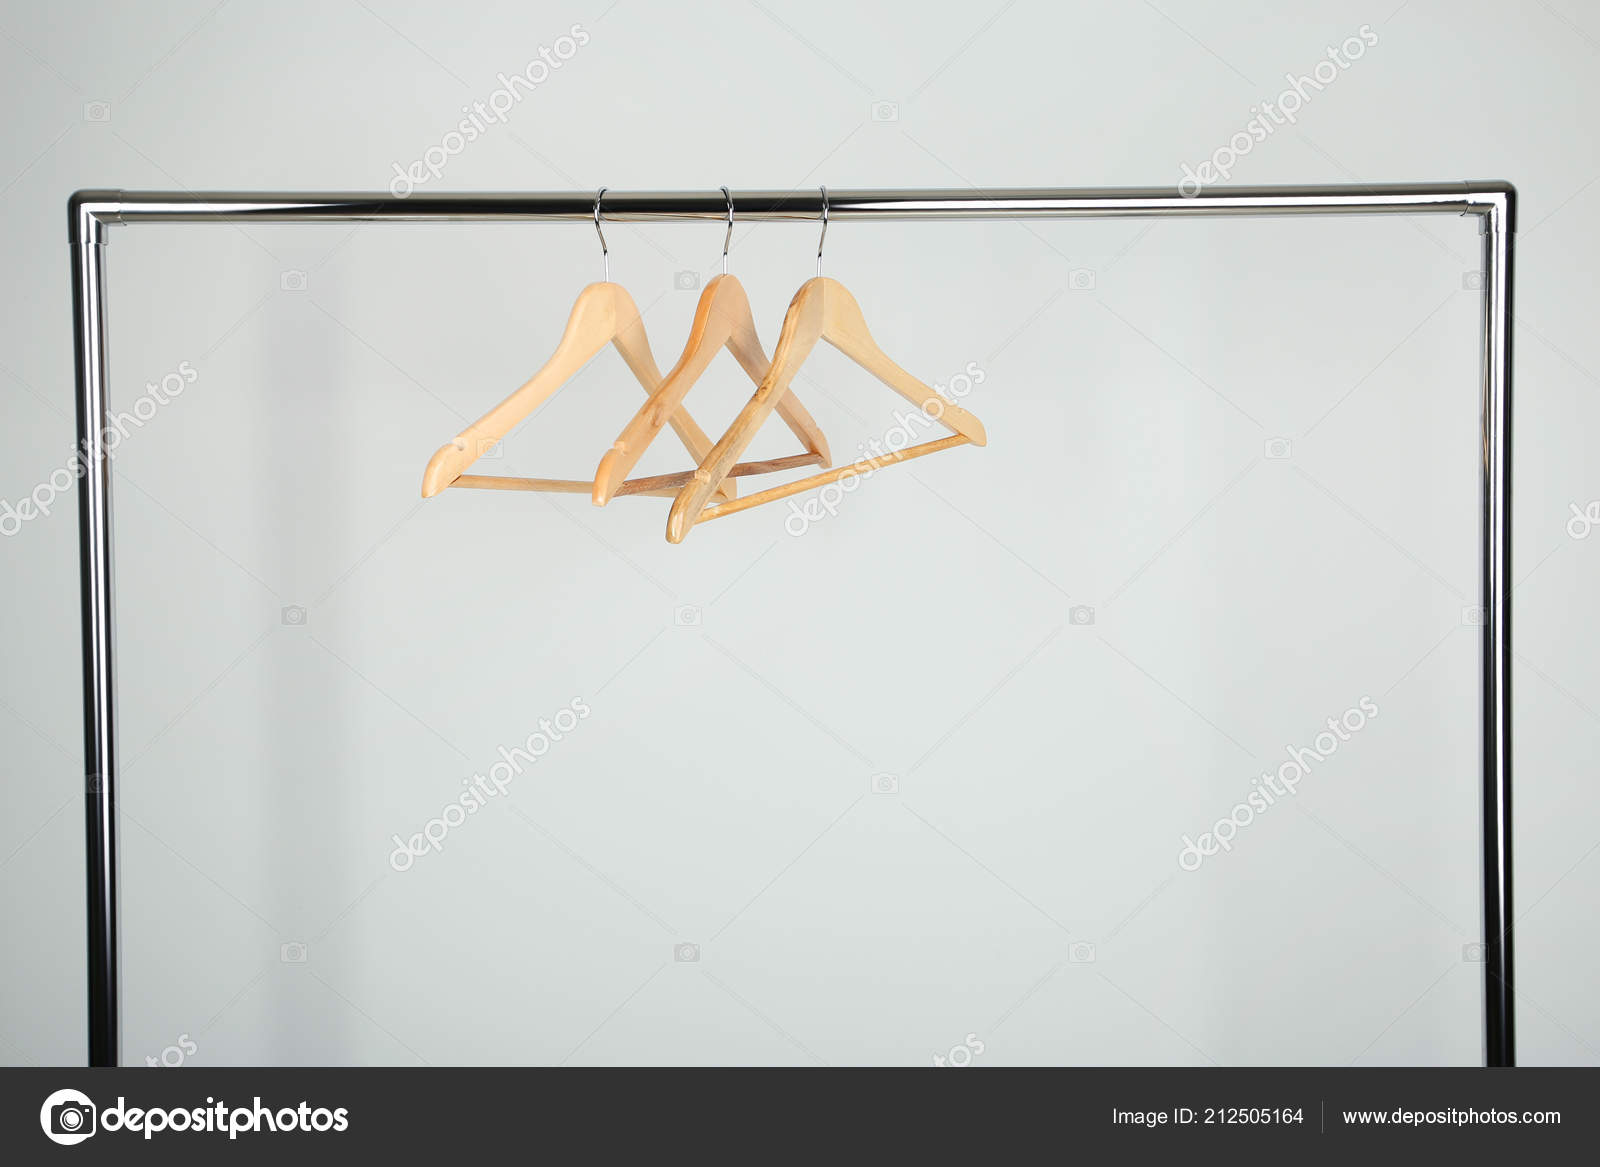 https depositphotos com 212505164 stock photo wooden clothes hangers rack white html